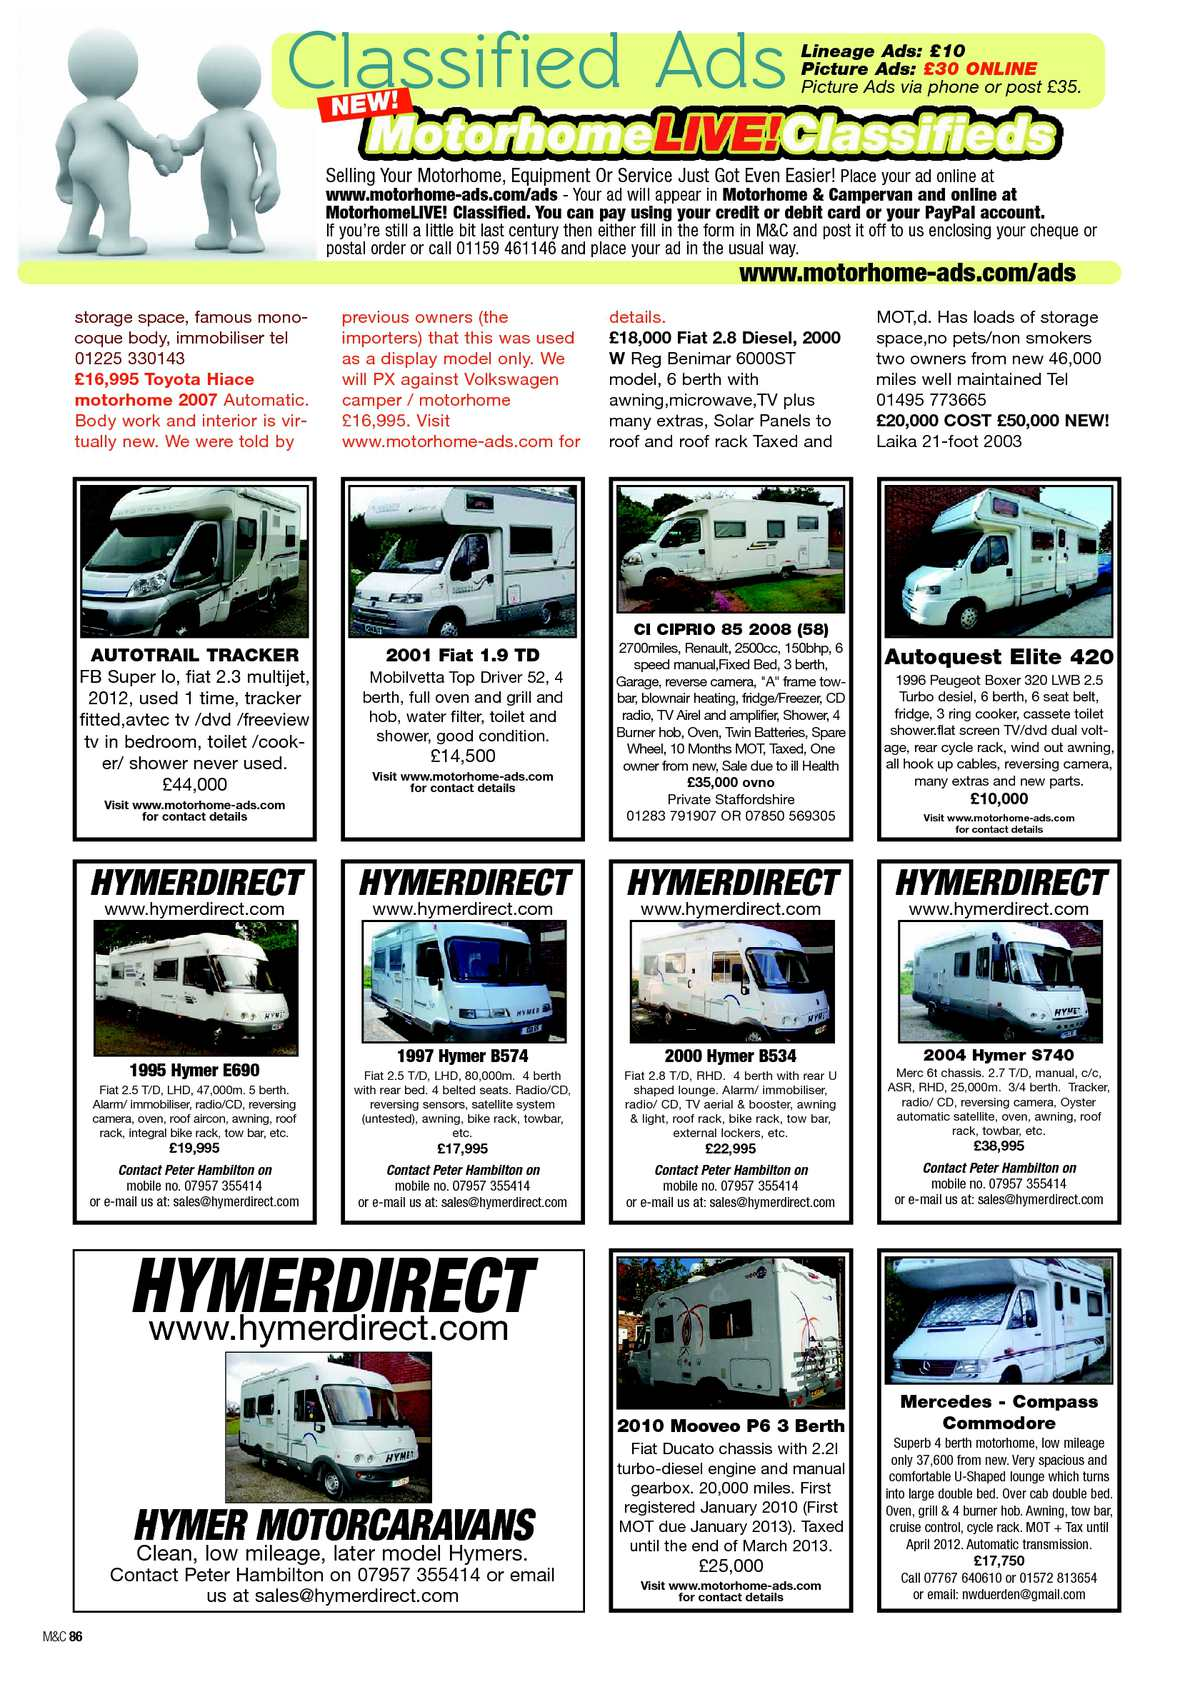 Feb 2013 motorhome campervan calameo downloader page 88 fandeluxe Gallery